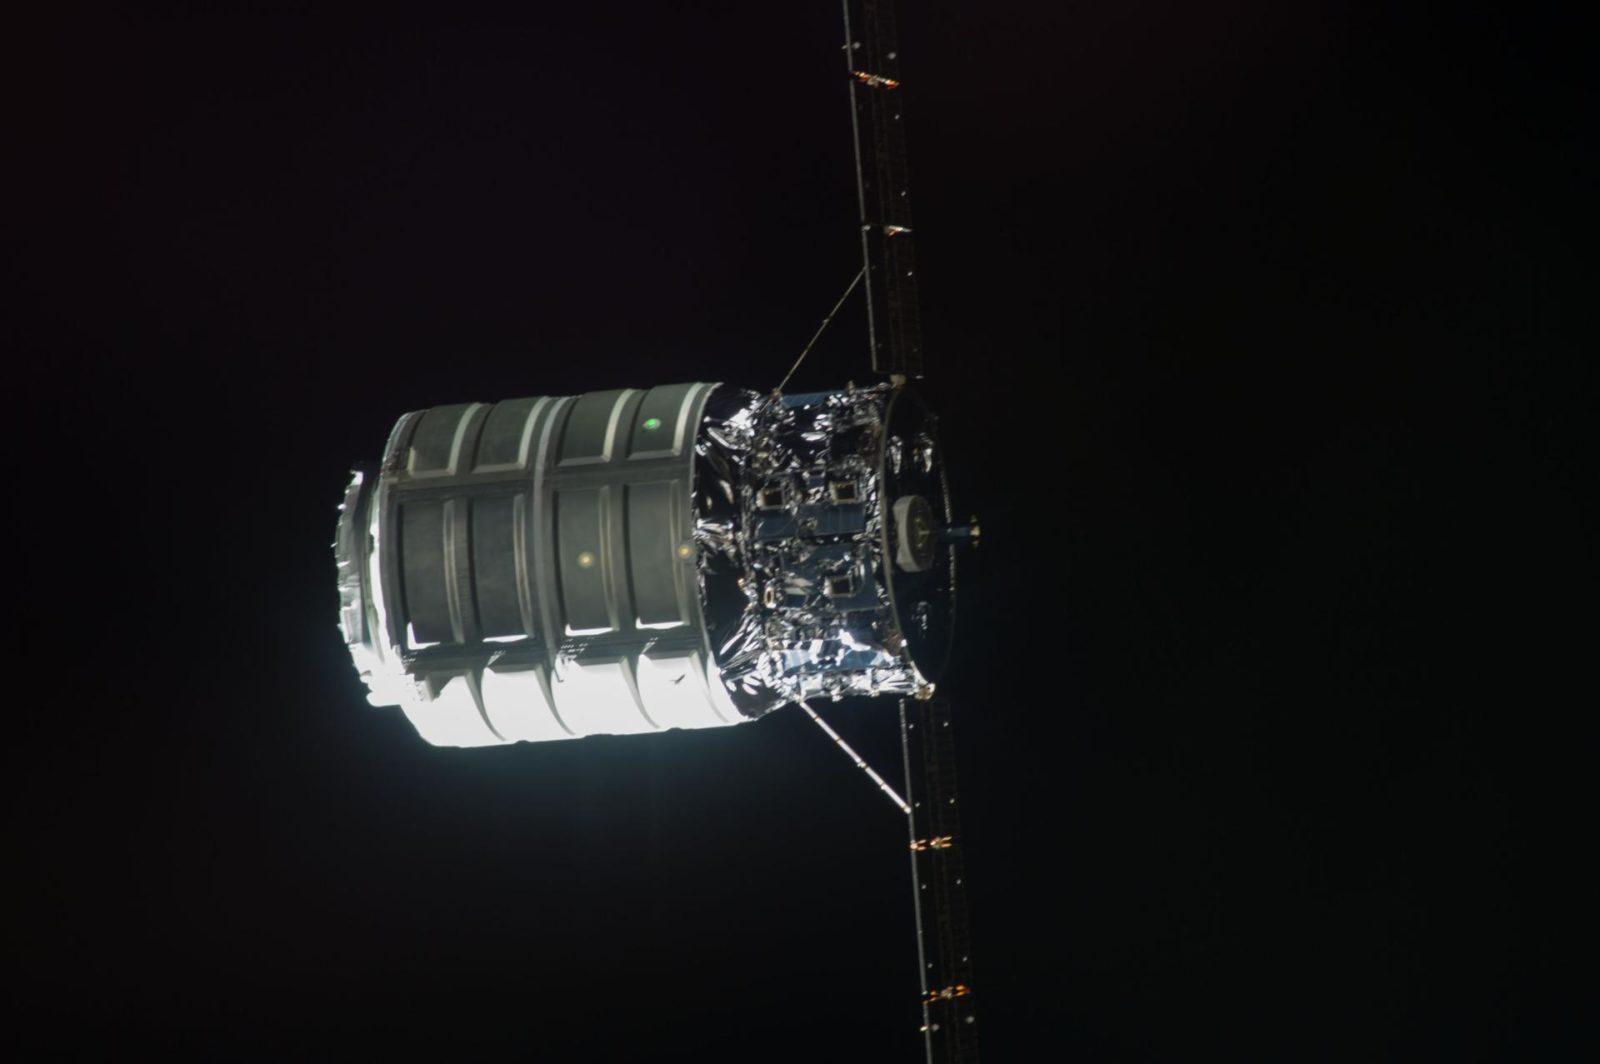 Cygnus Approach